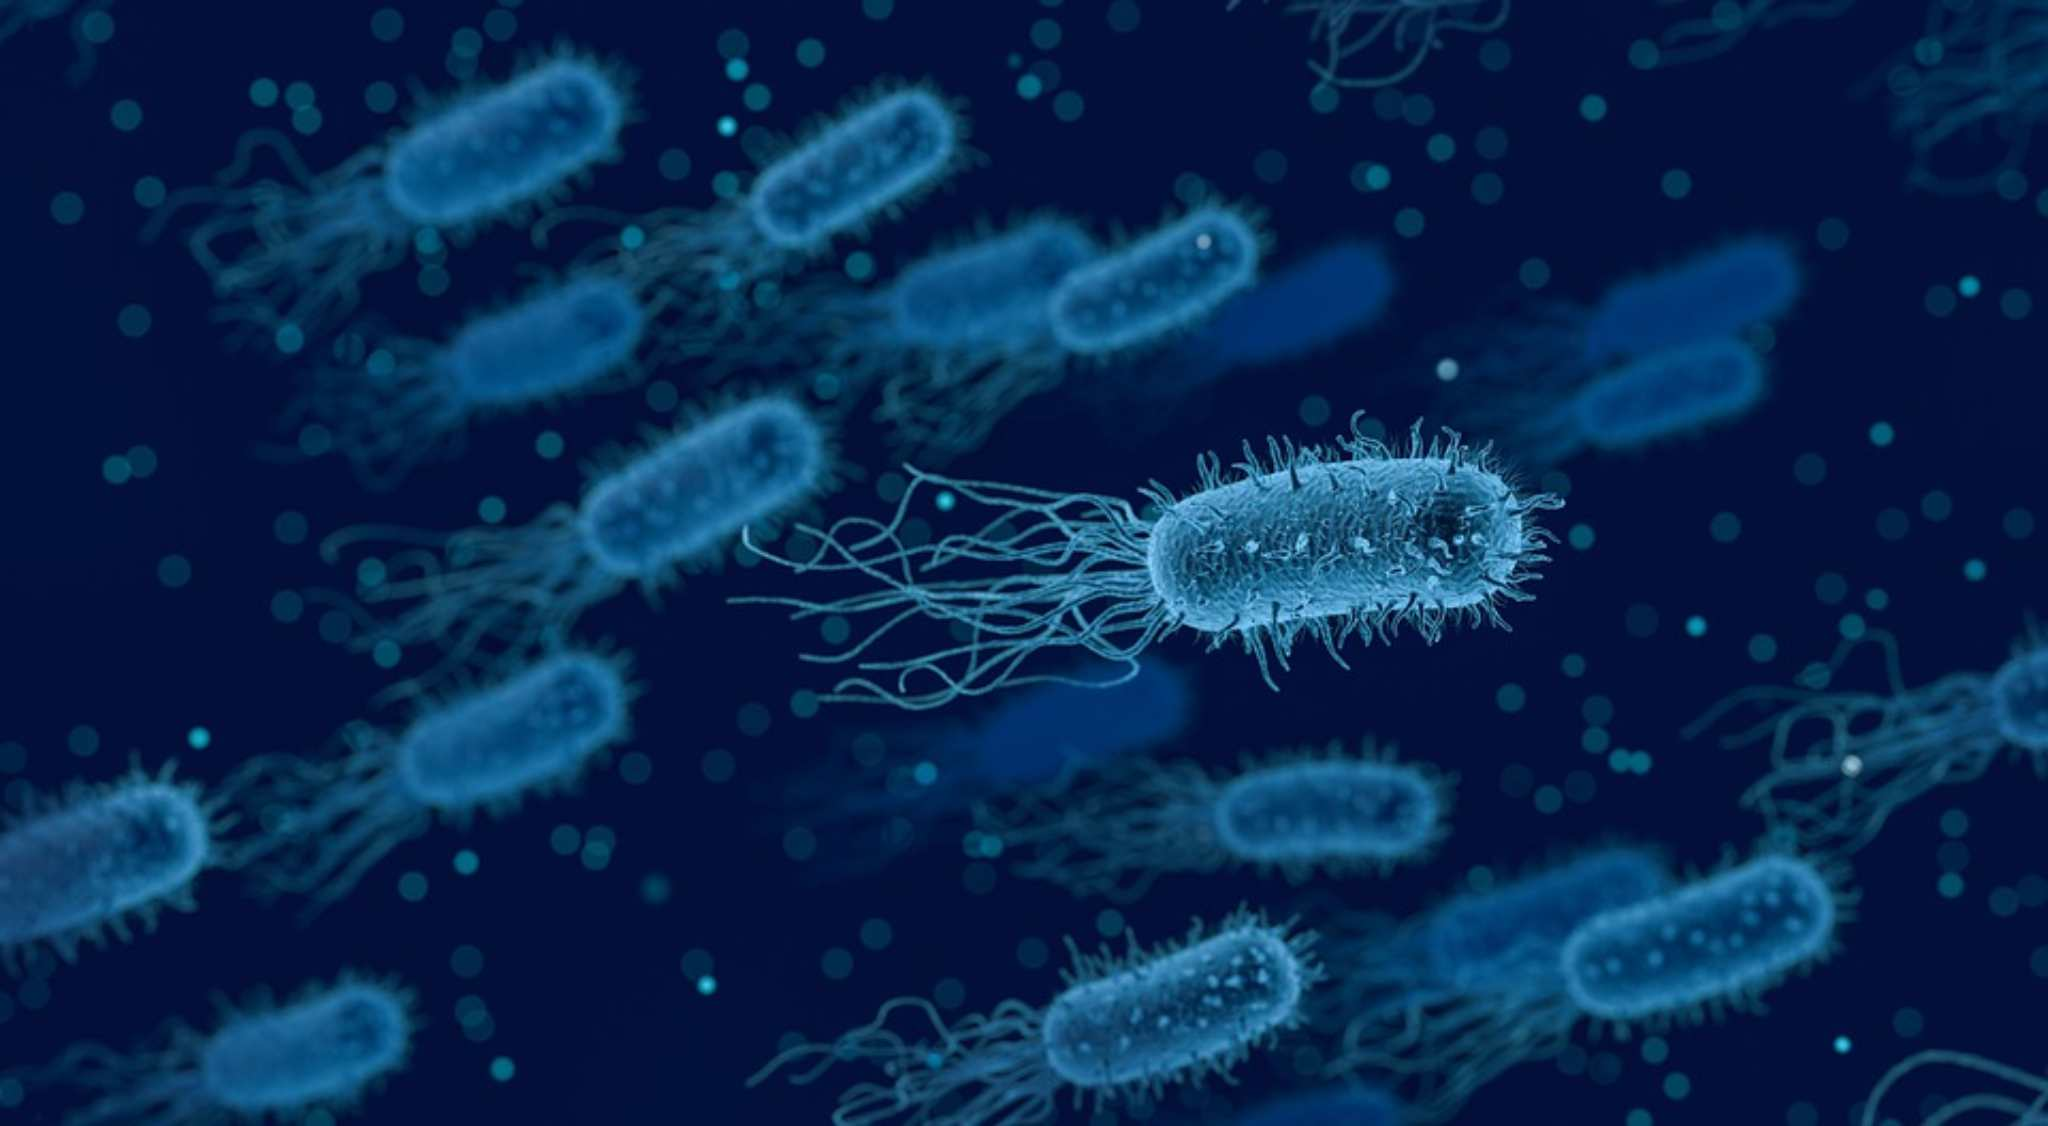 il microbiota umano